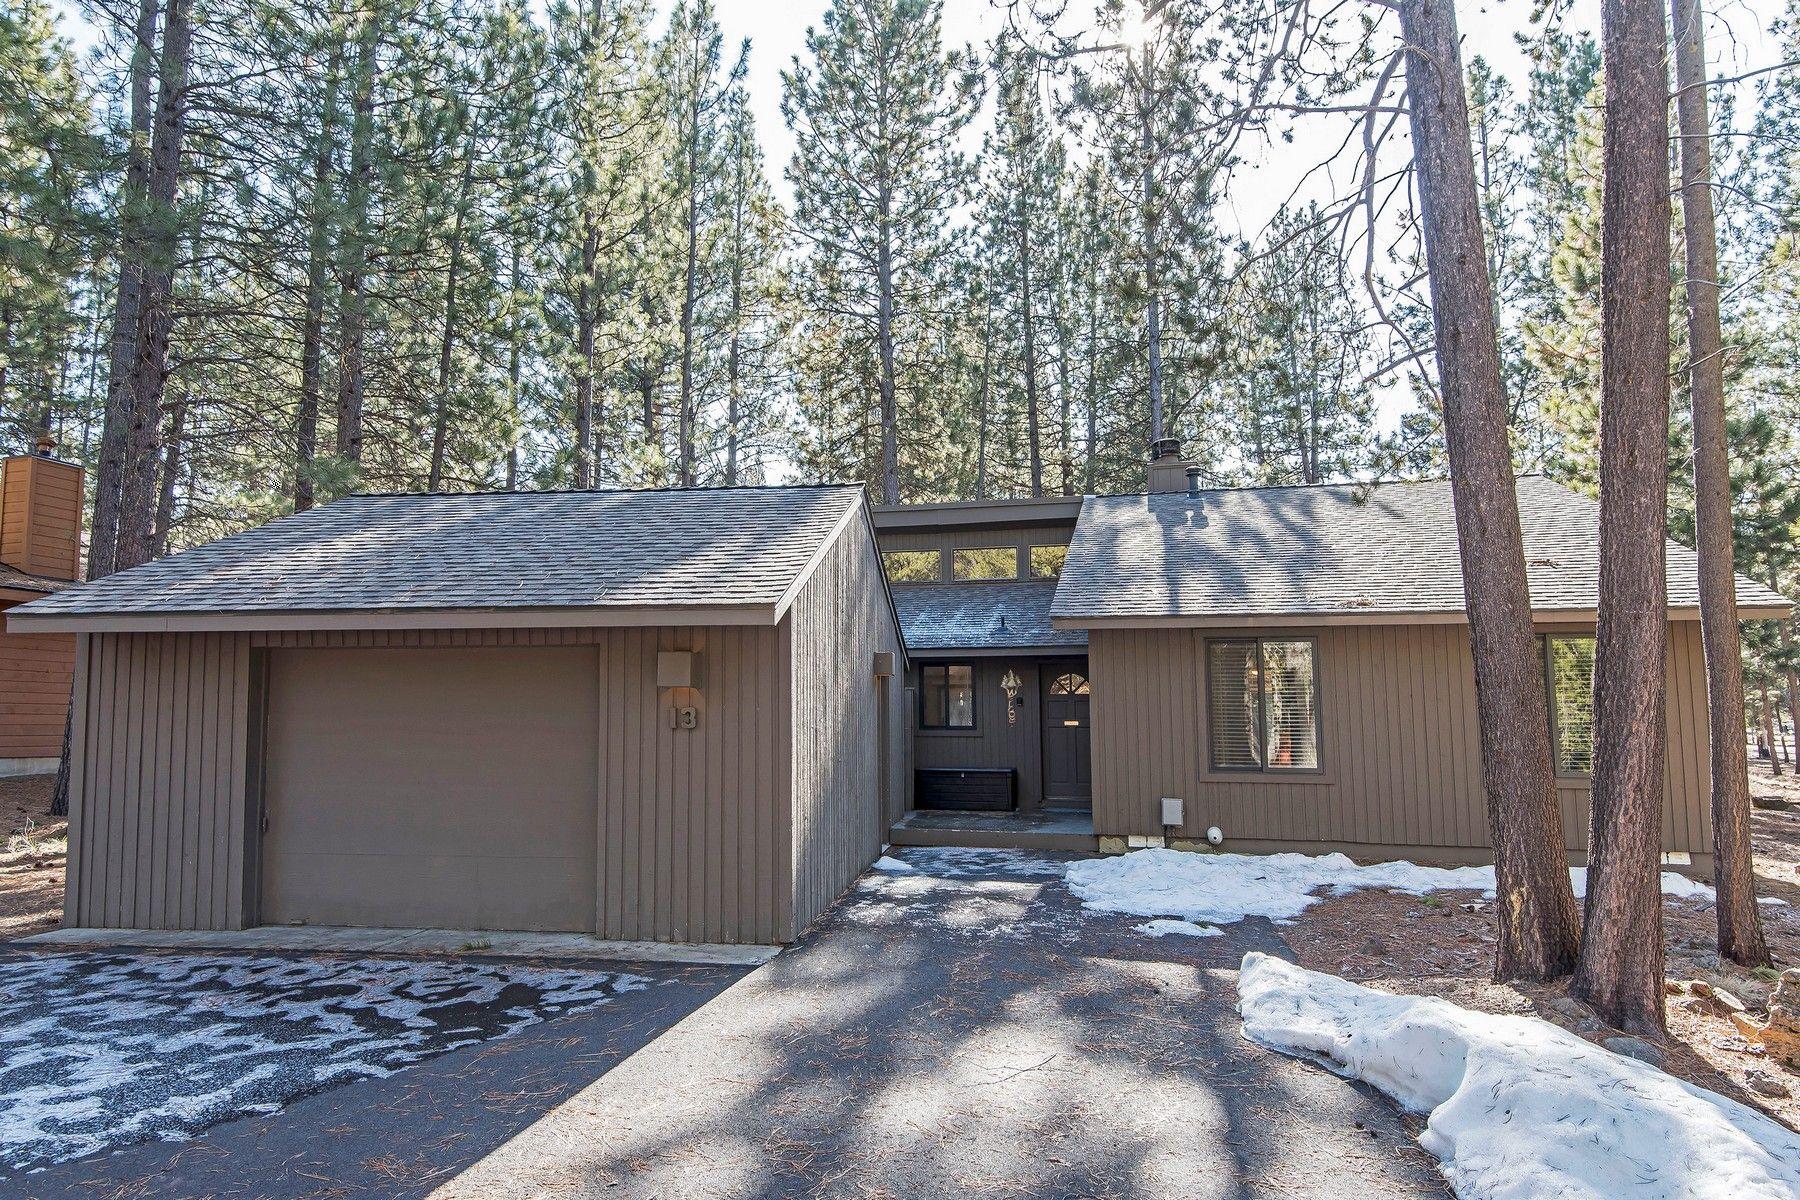 Other Residential Homes για την Πώληση στο 18133 Timber Lane 13 Sunriver, OR 97707 Sunriver, Ορεγκον 97707 Ηνωμένες Πολιτείες